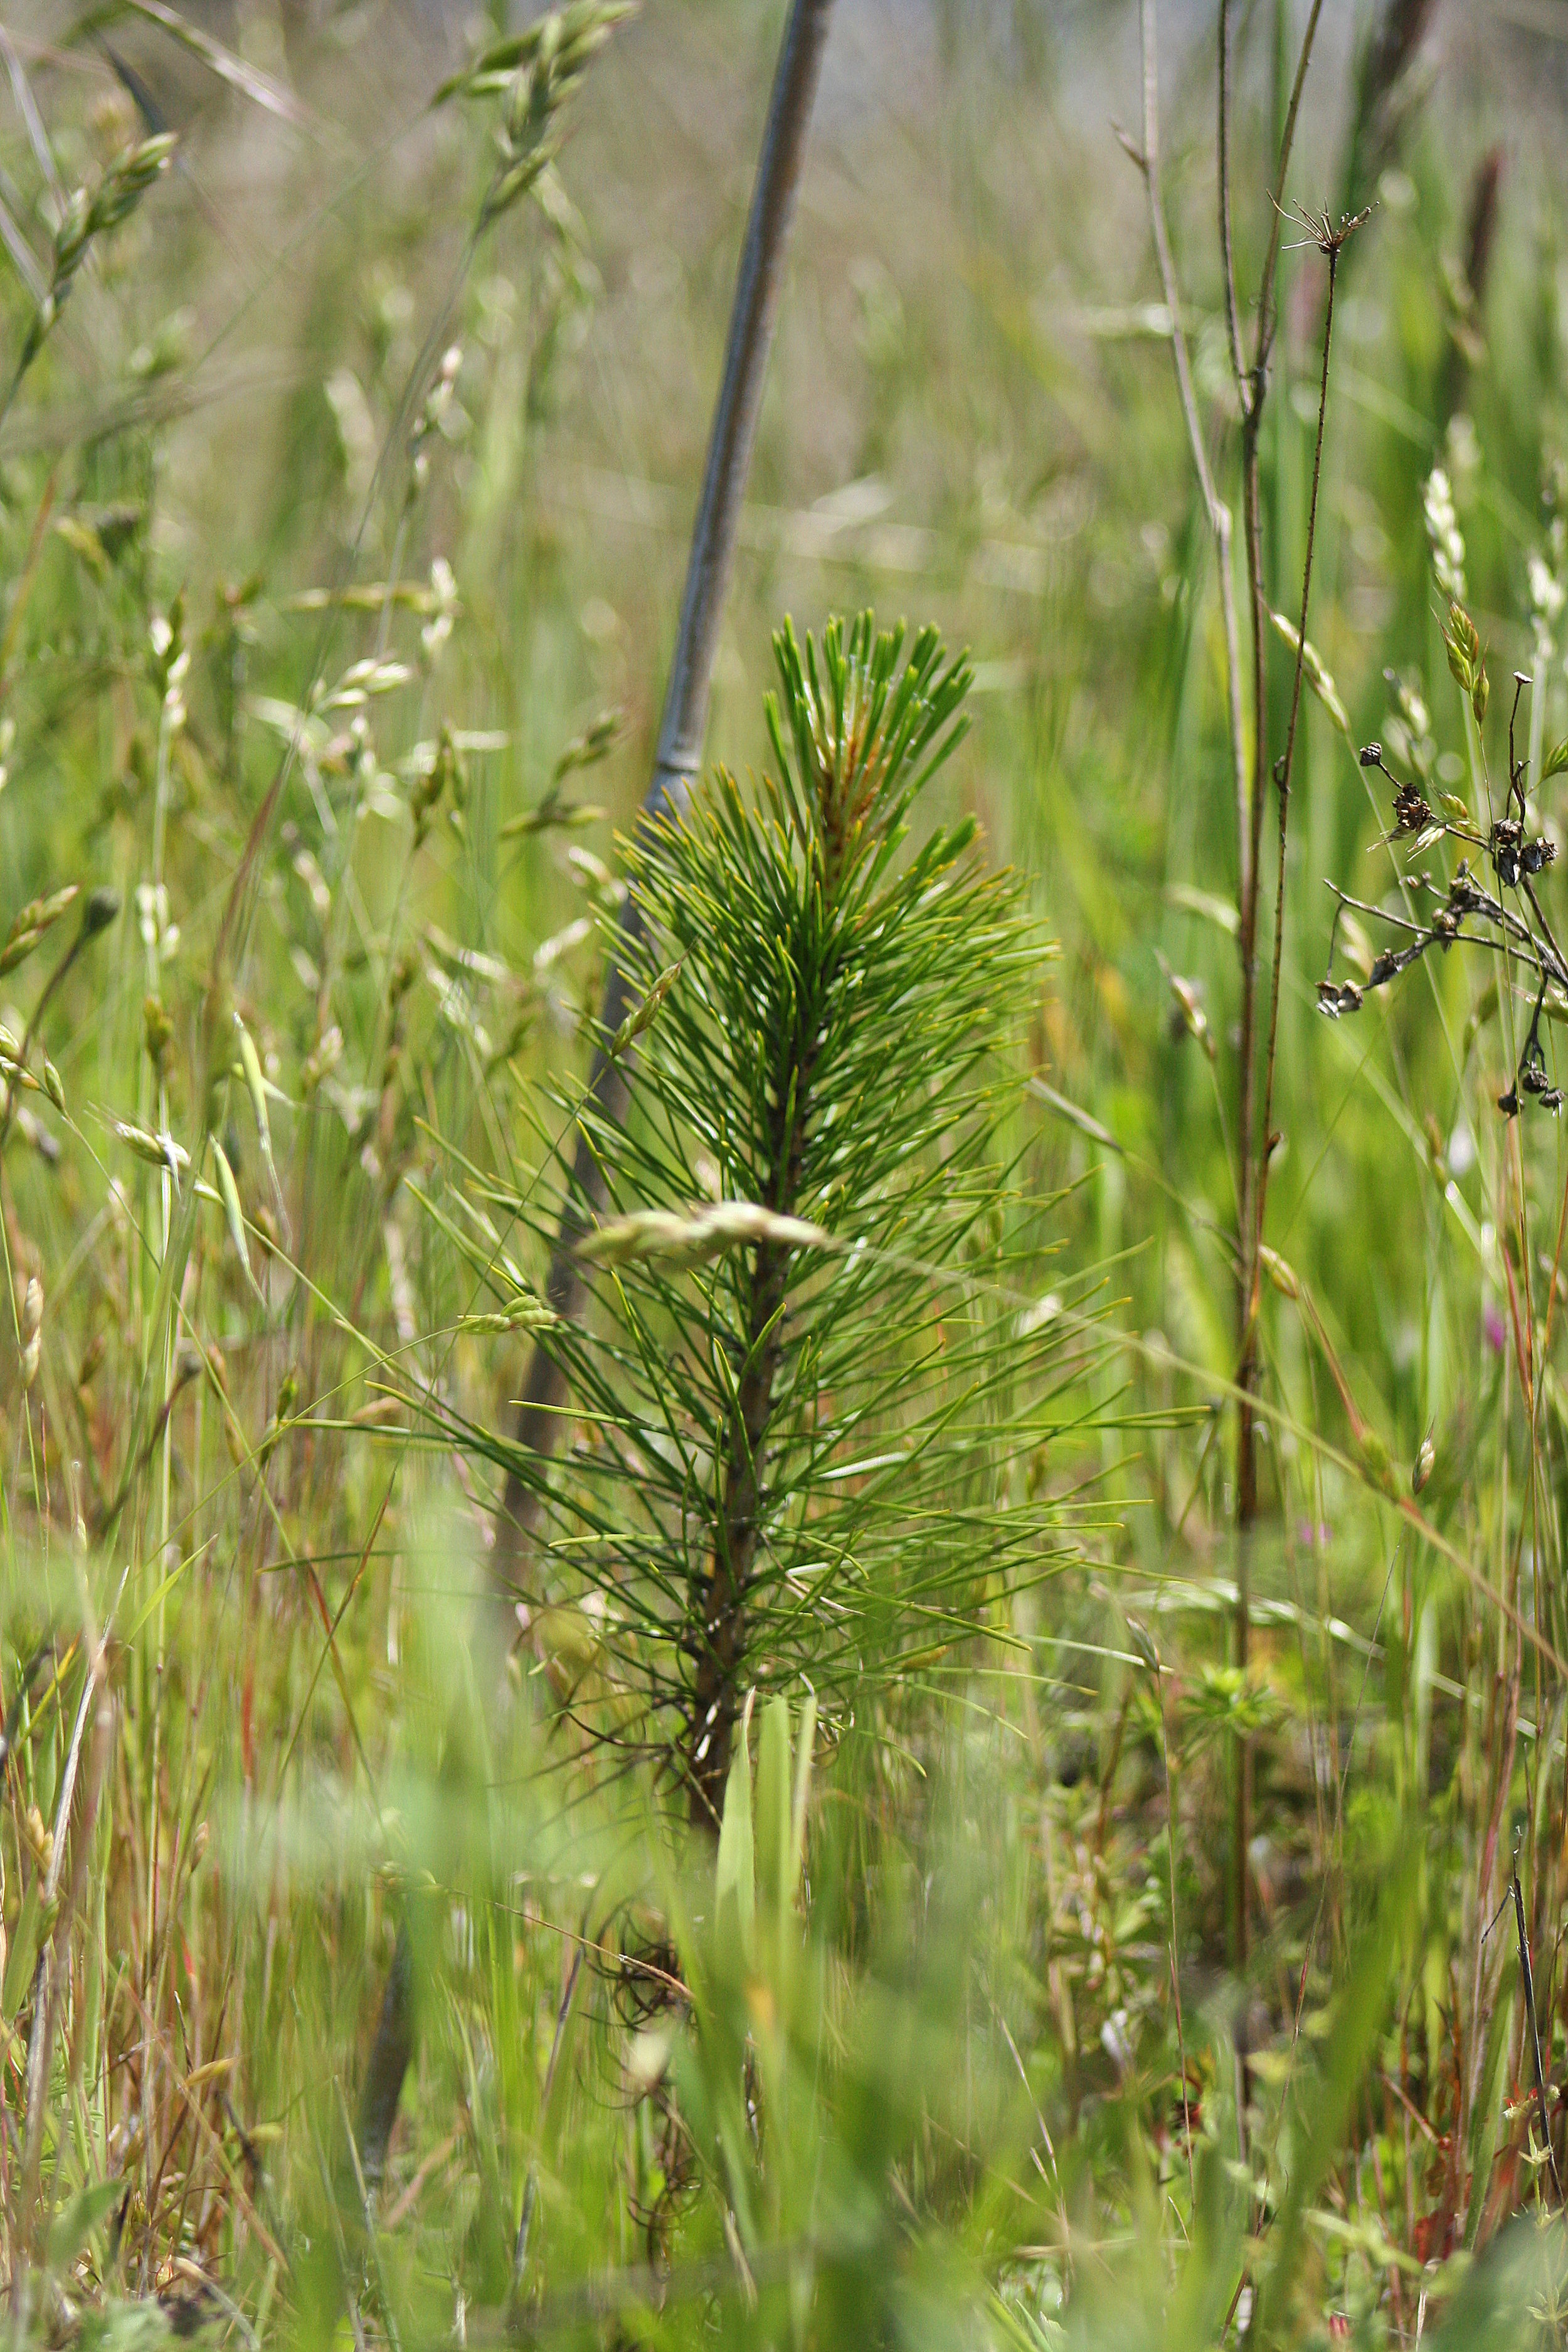 Ponderosa Pine seedling